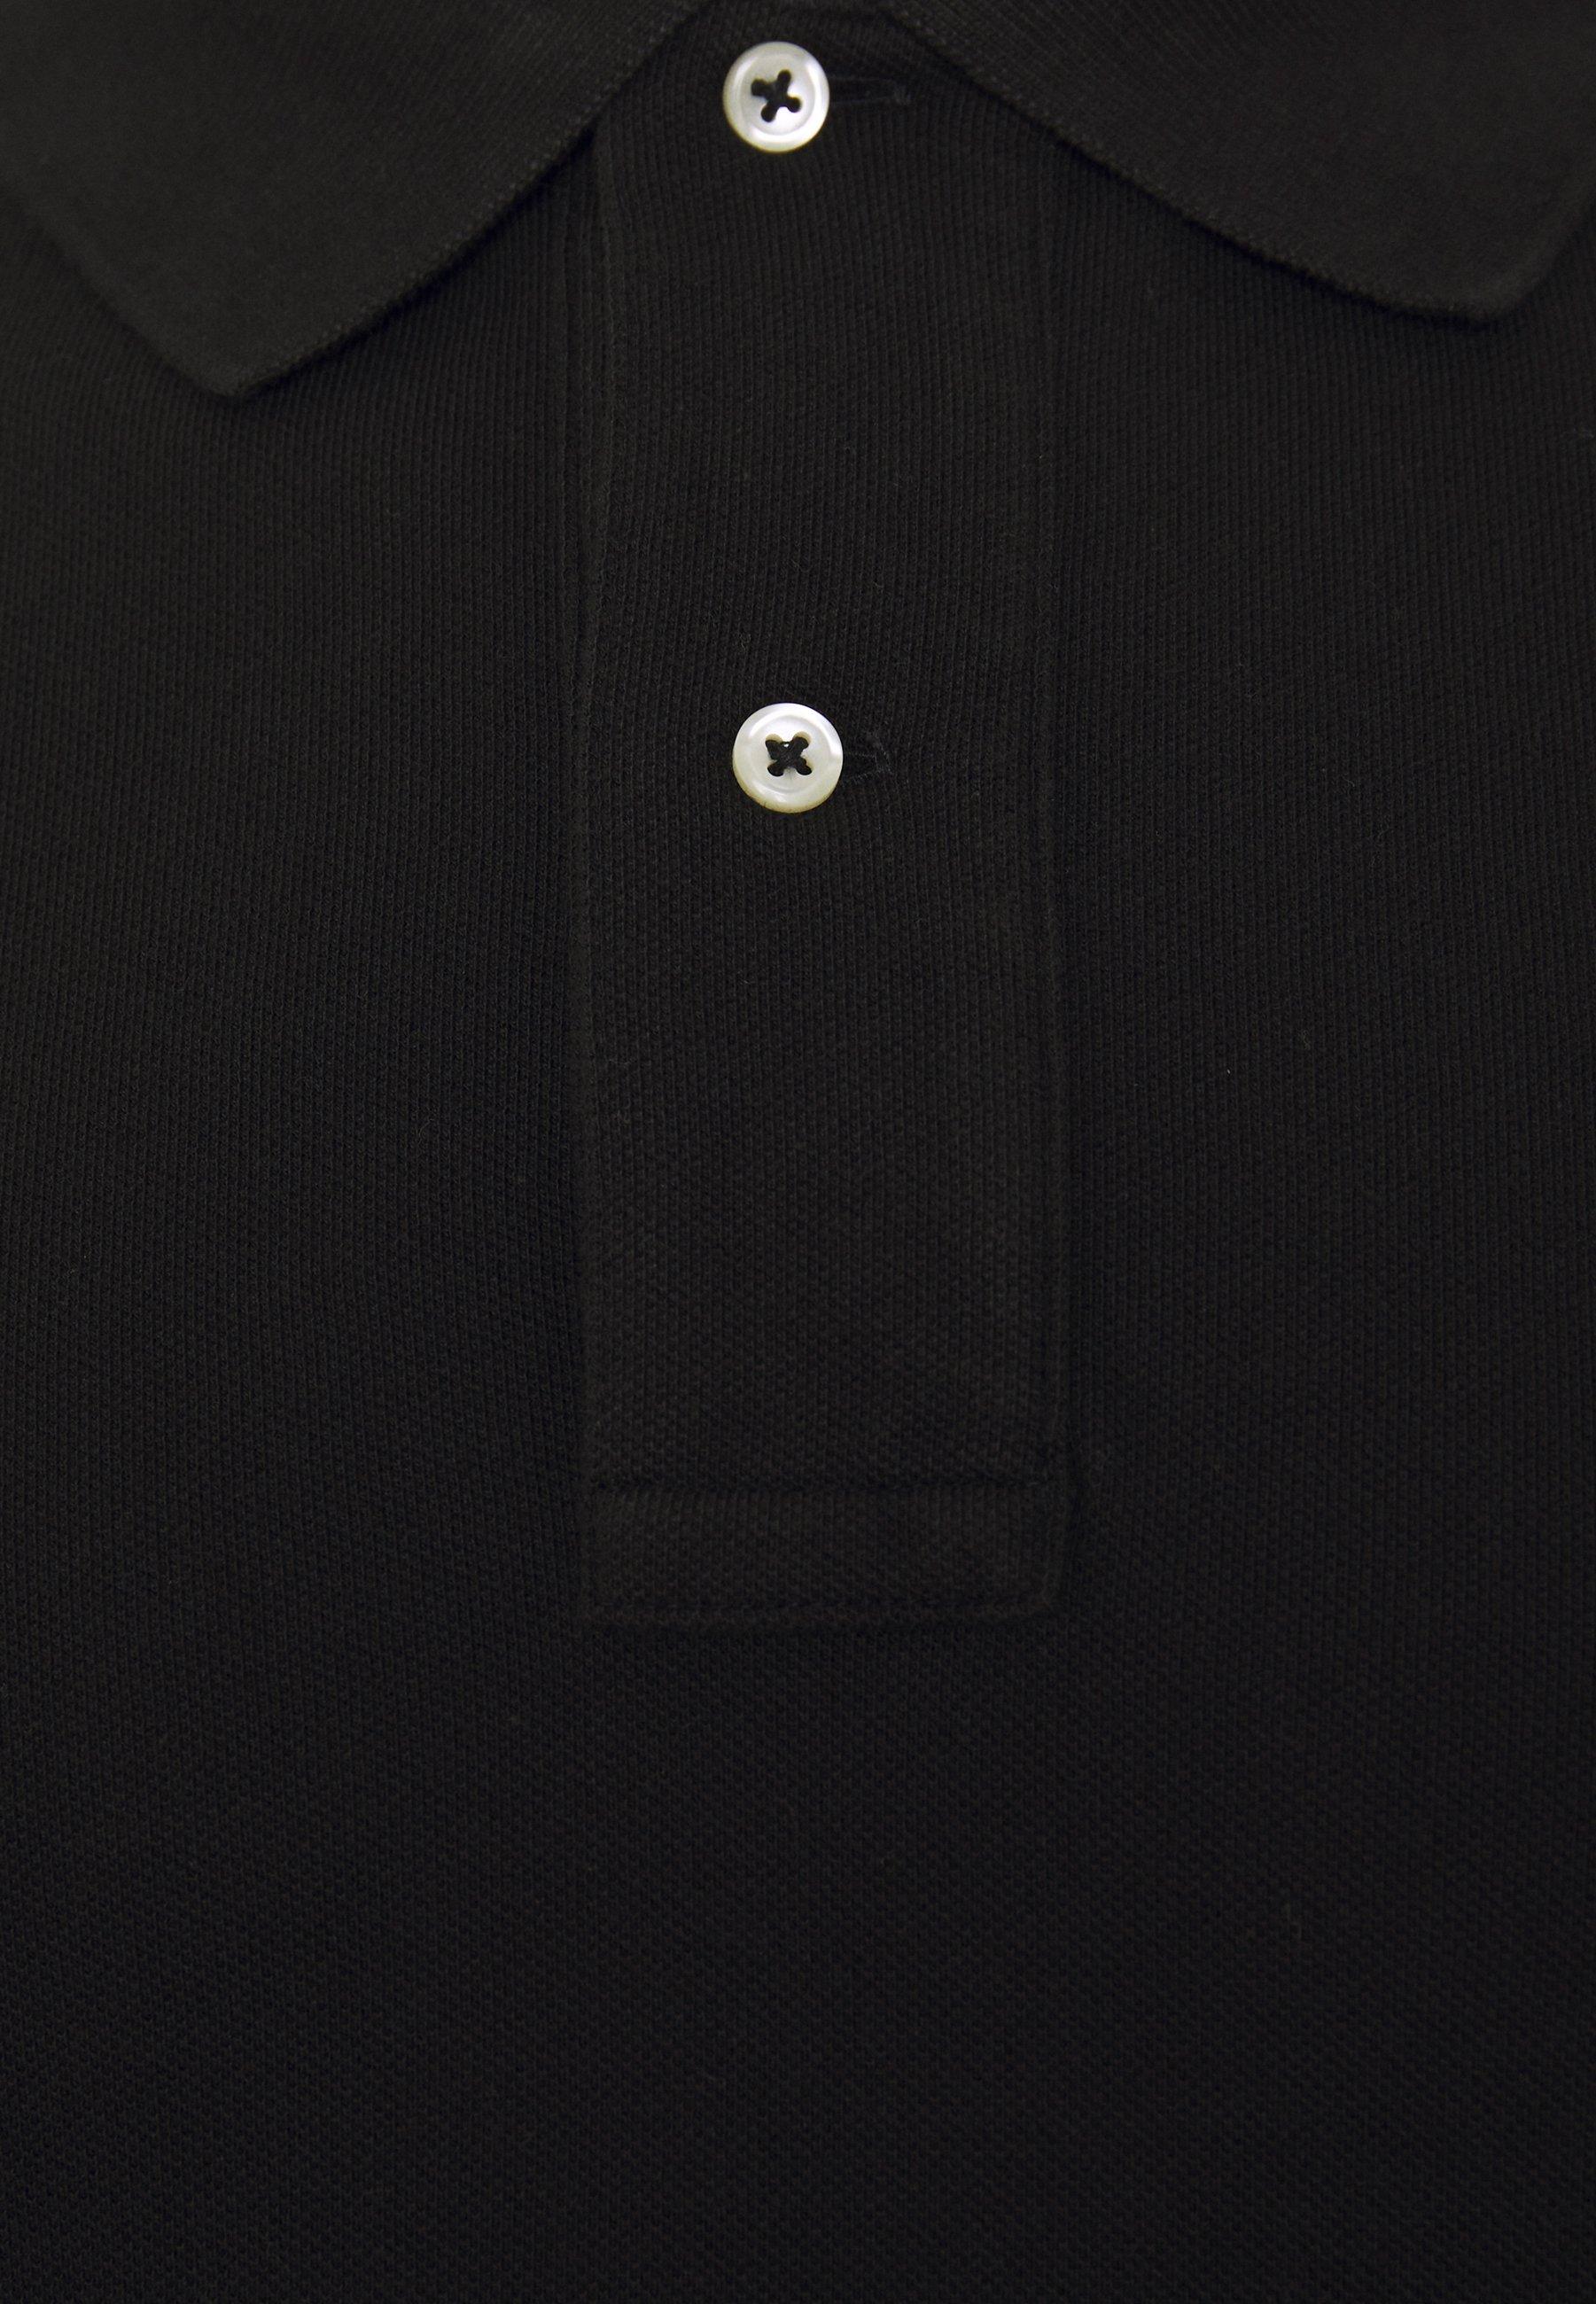 Polo Ralph Lauren CHINO Chemise black ZALANDO.FR